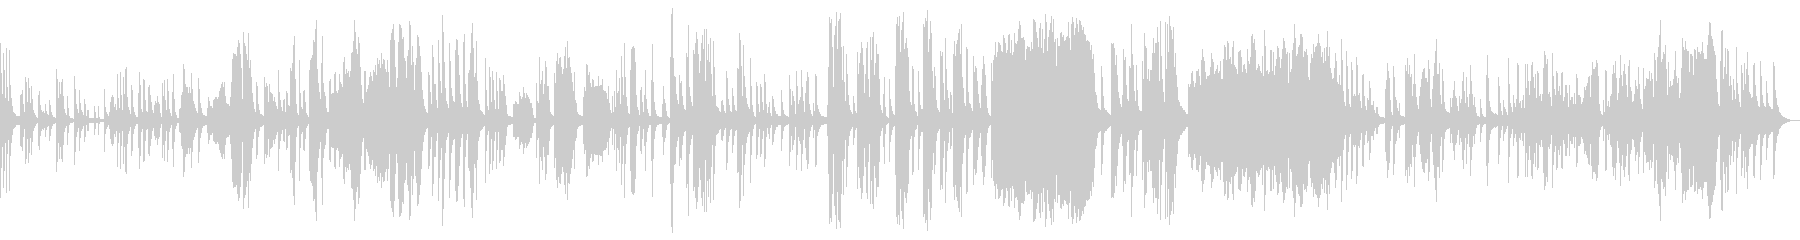 KANTピアノバラード即興曲209の未再生の波形